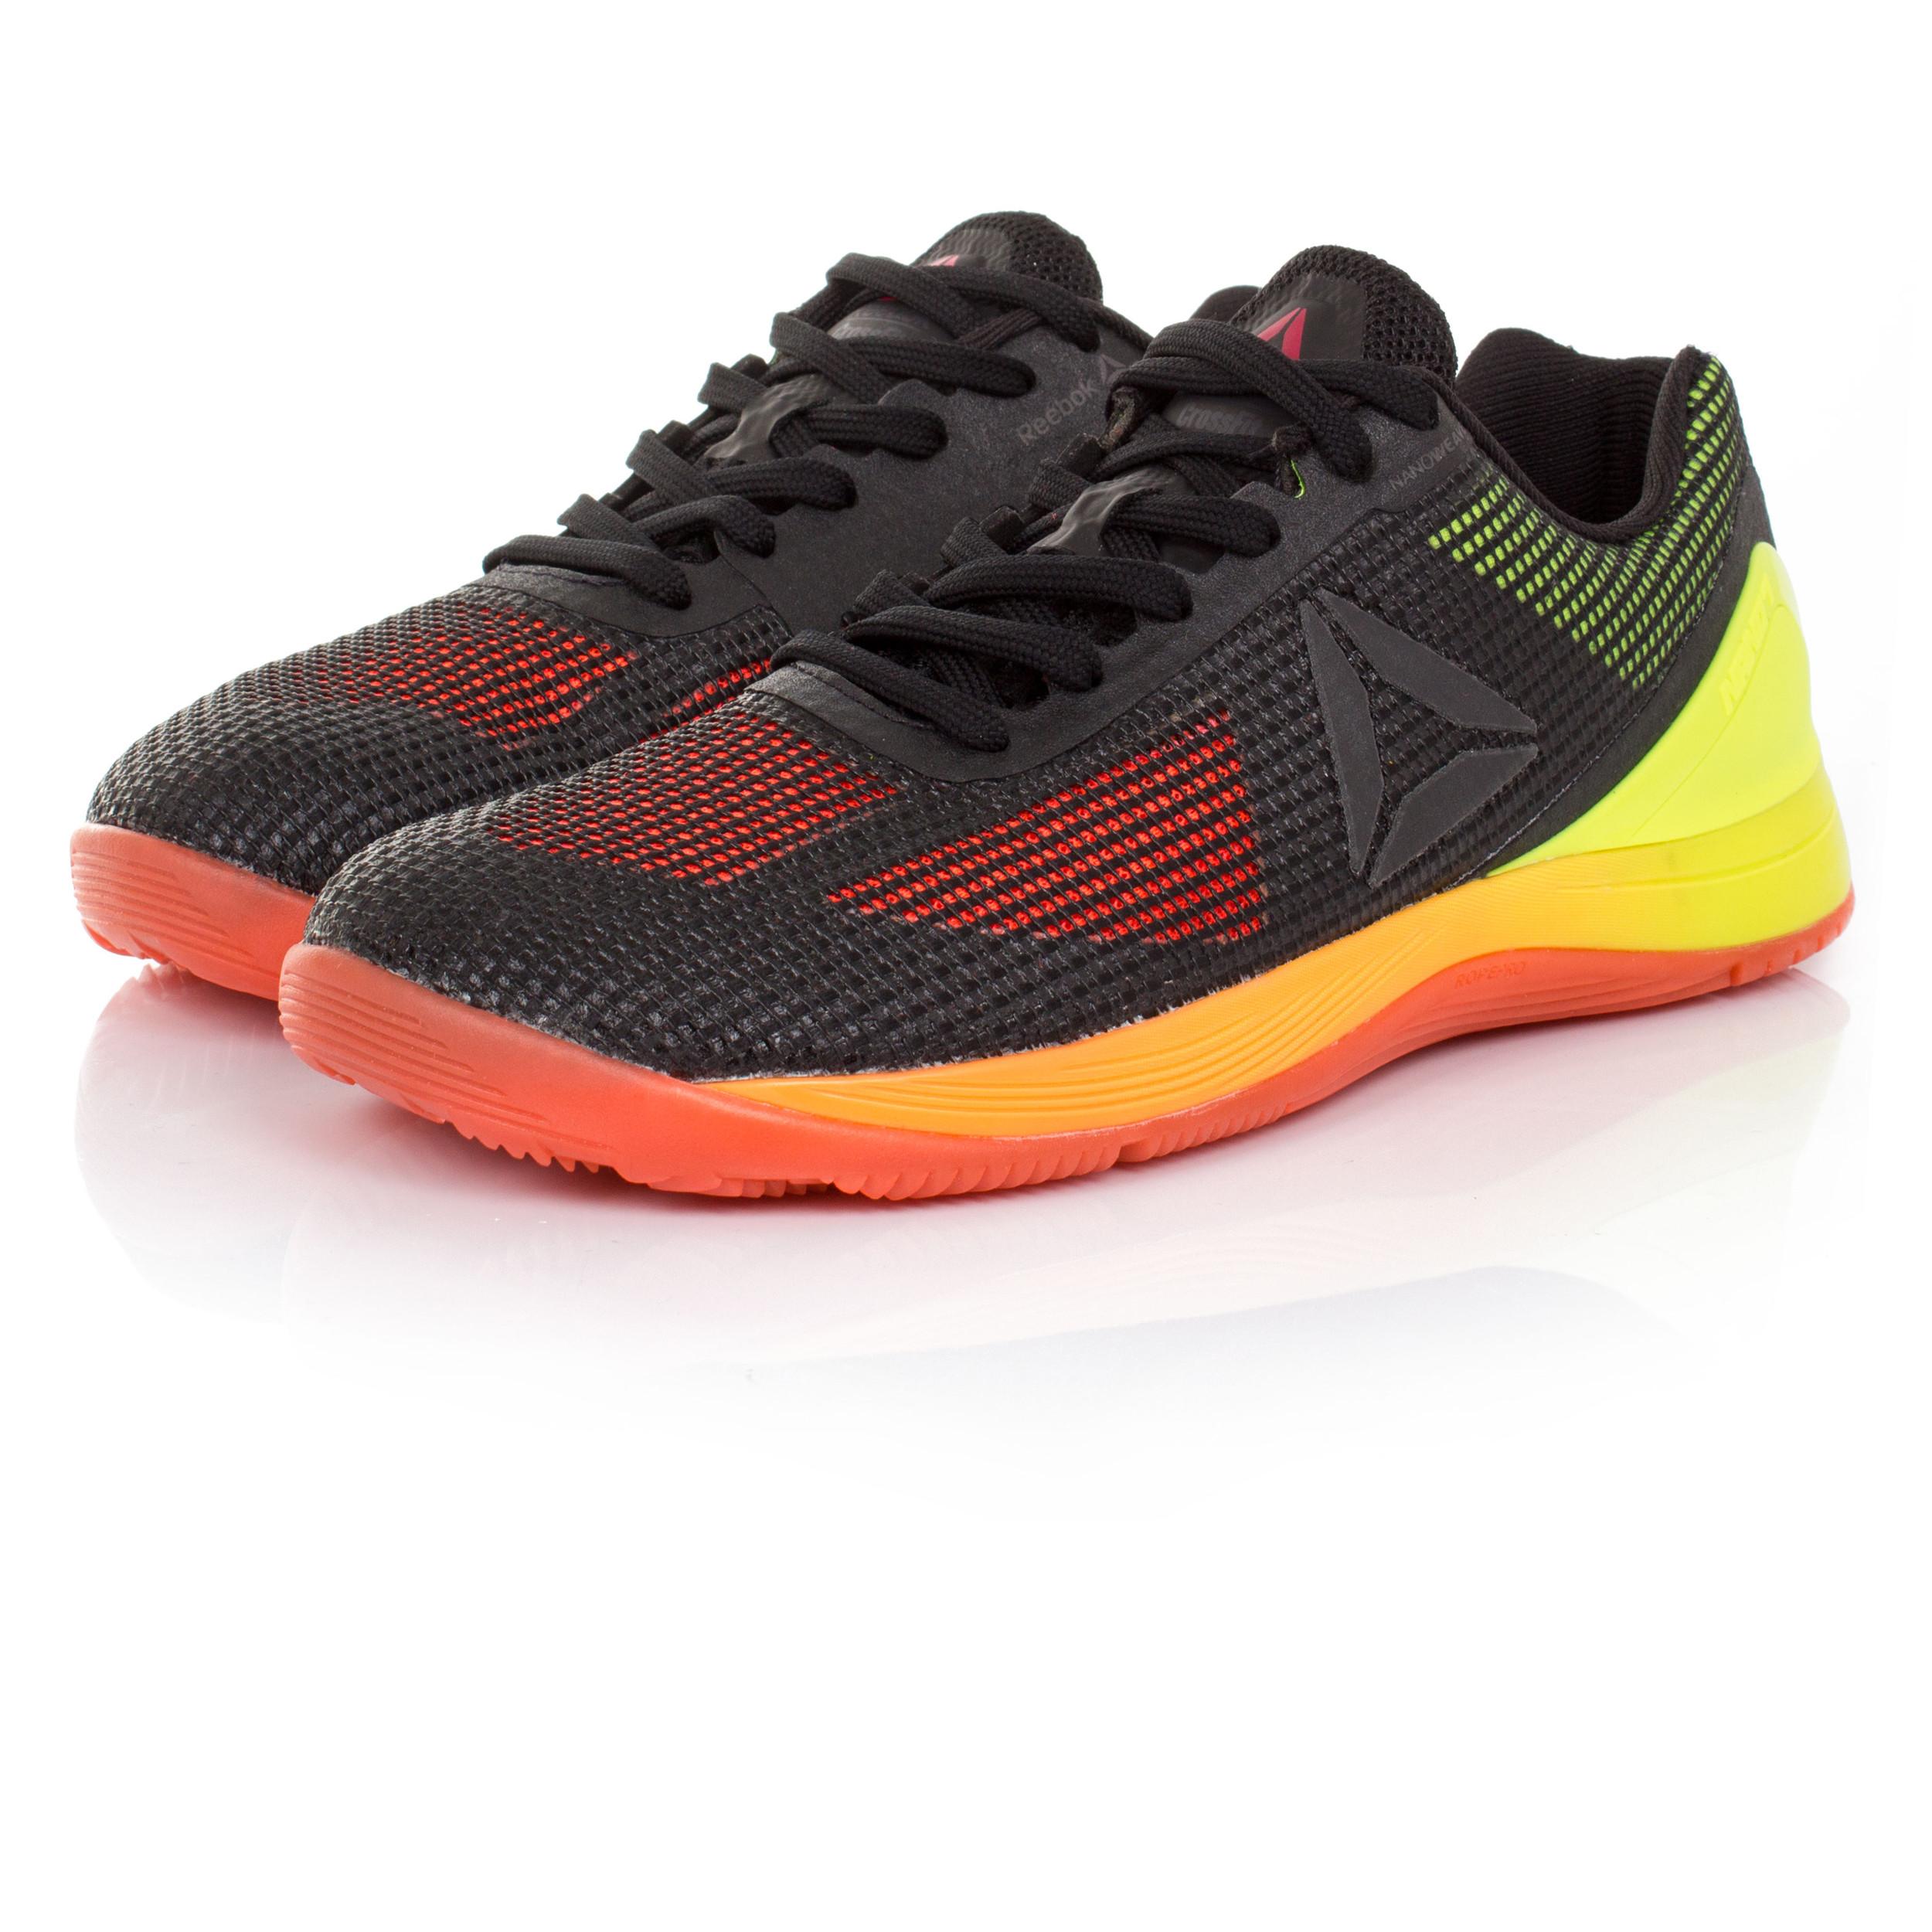 Womens Black Crossfit Shoes